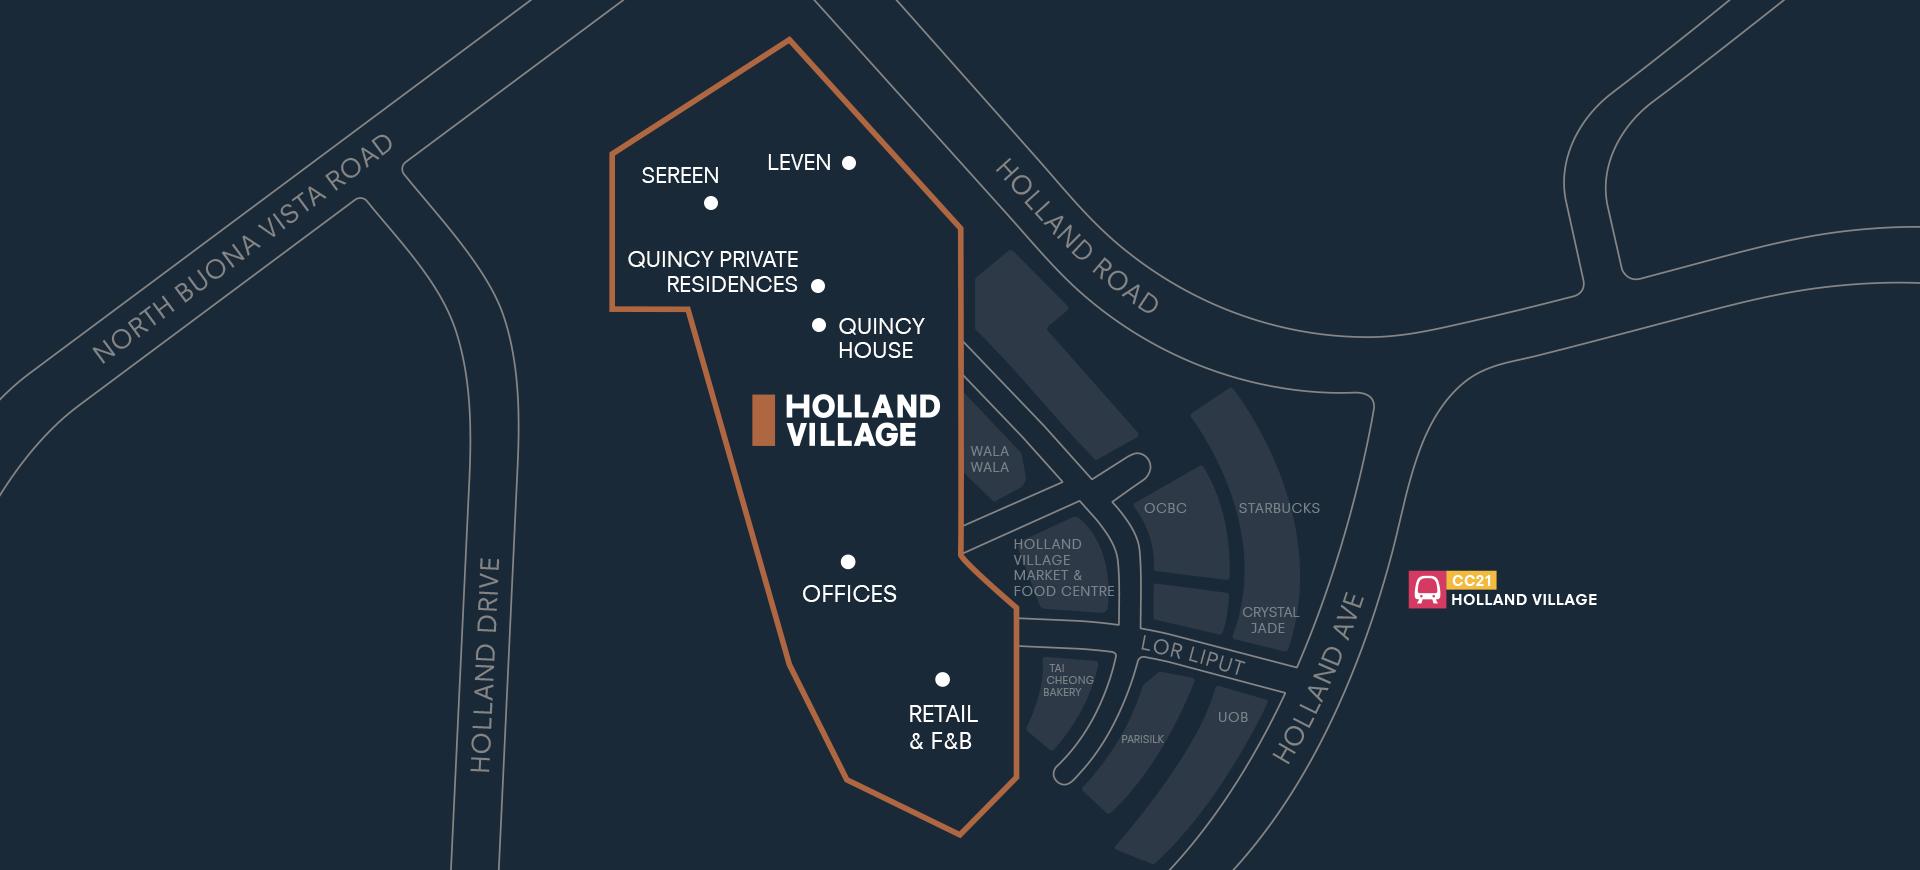 holland village extension